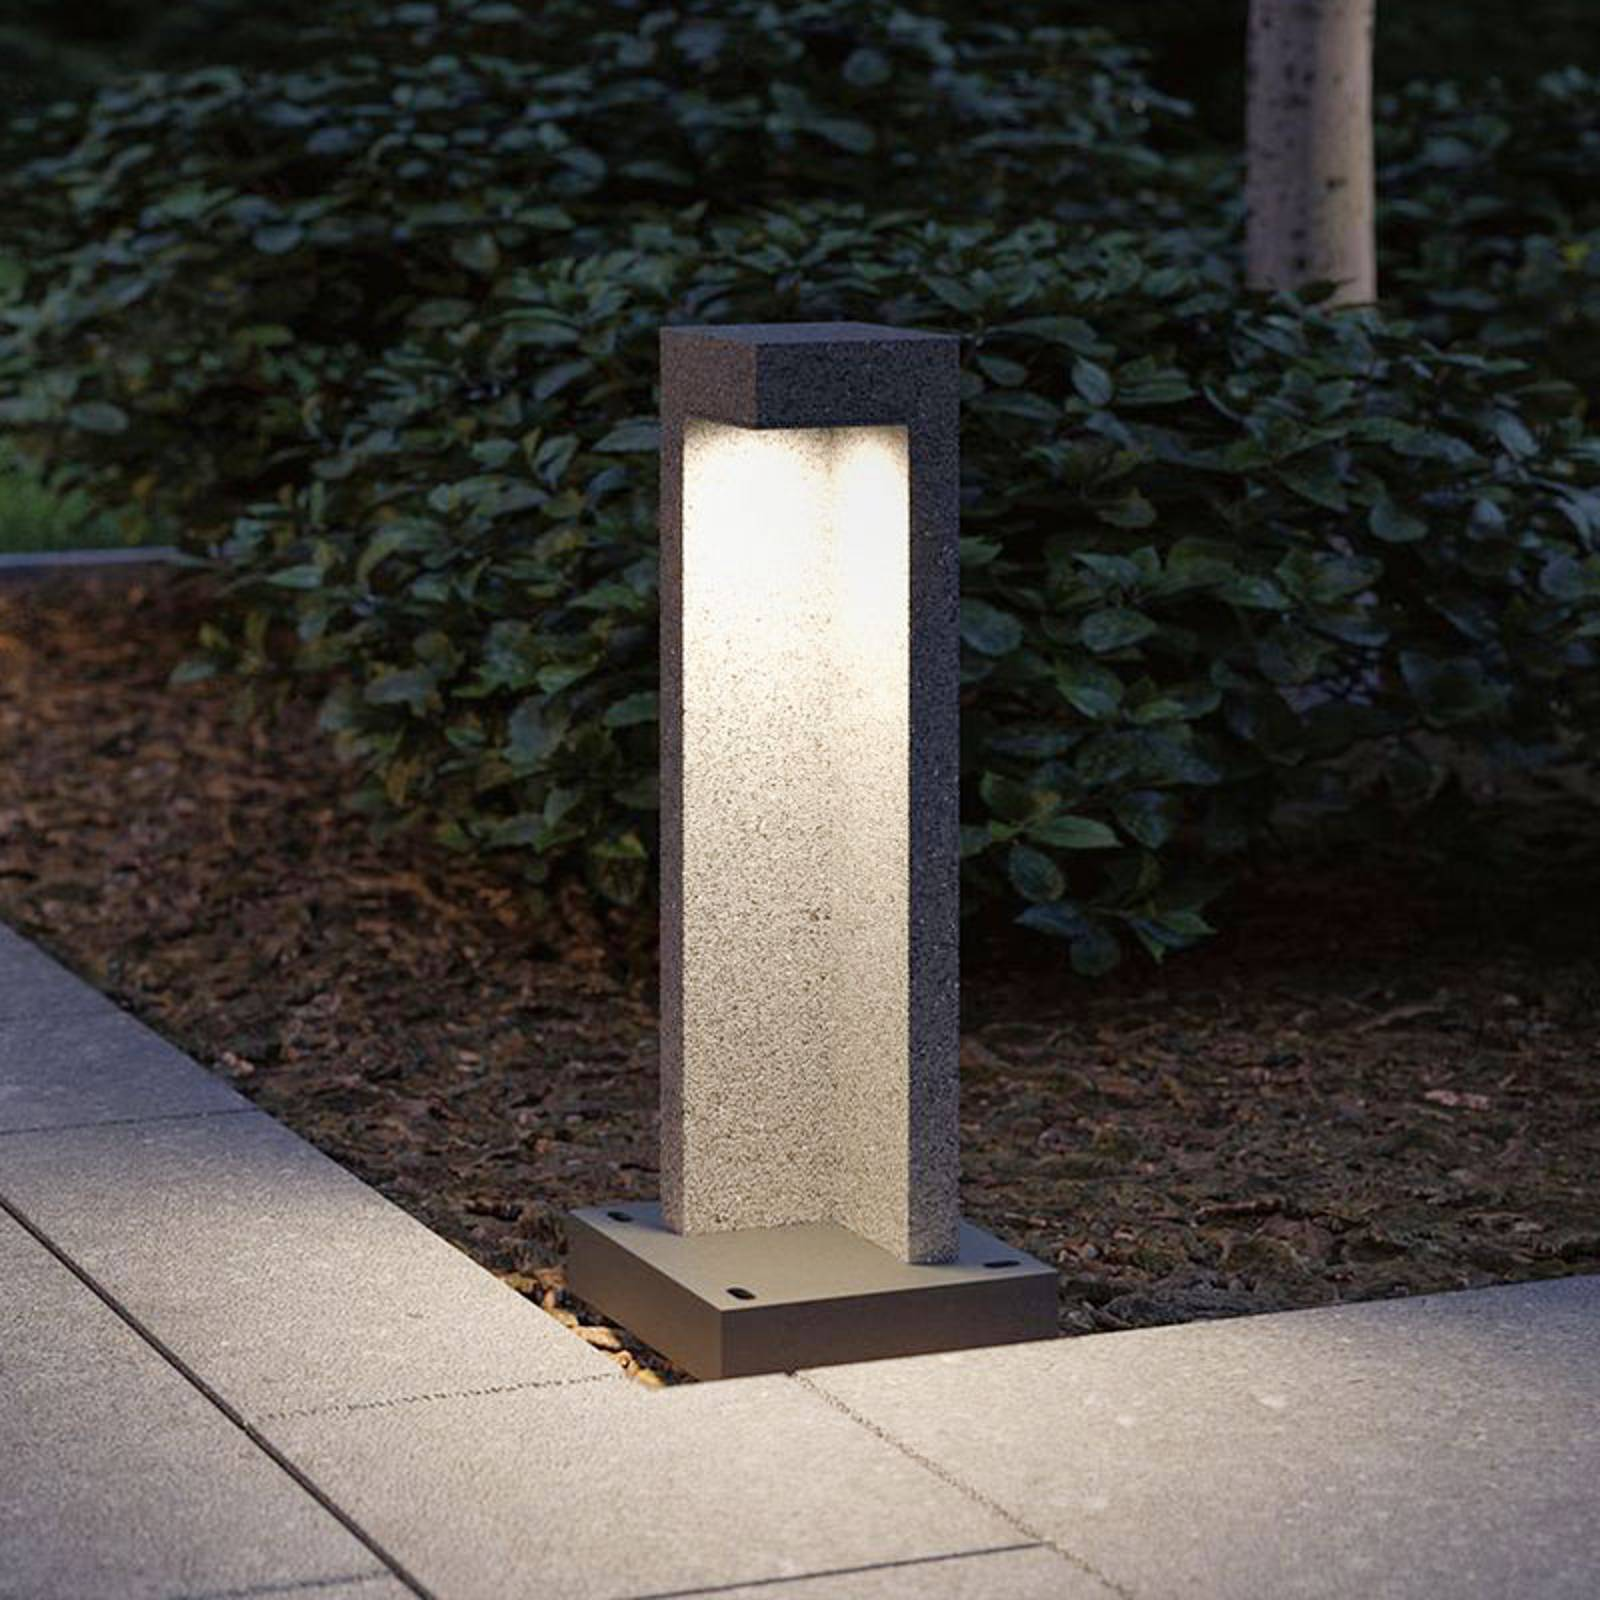 Paulmann Concrea LED-Sockelleuchte, Höhe 45 cm